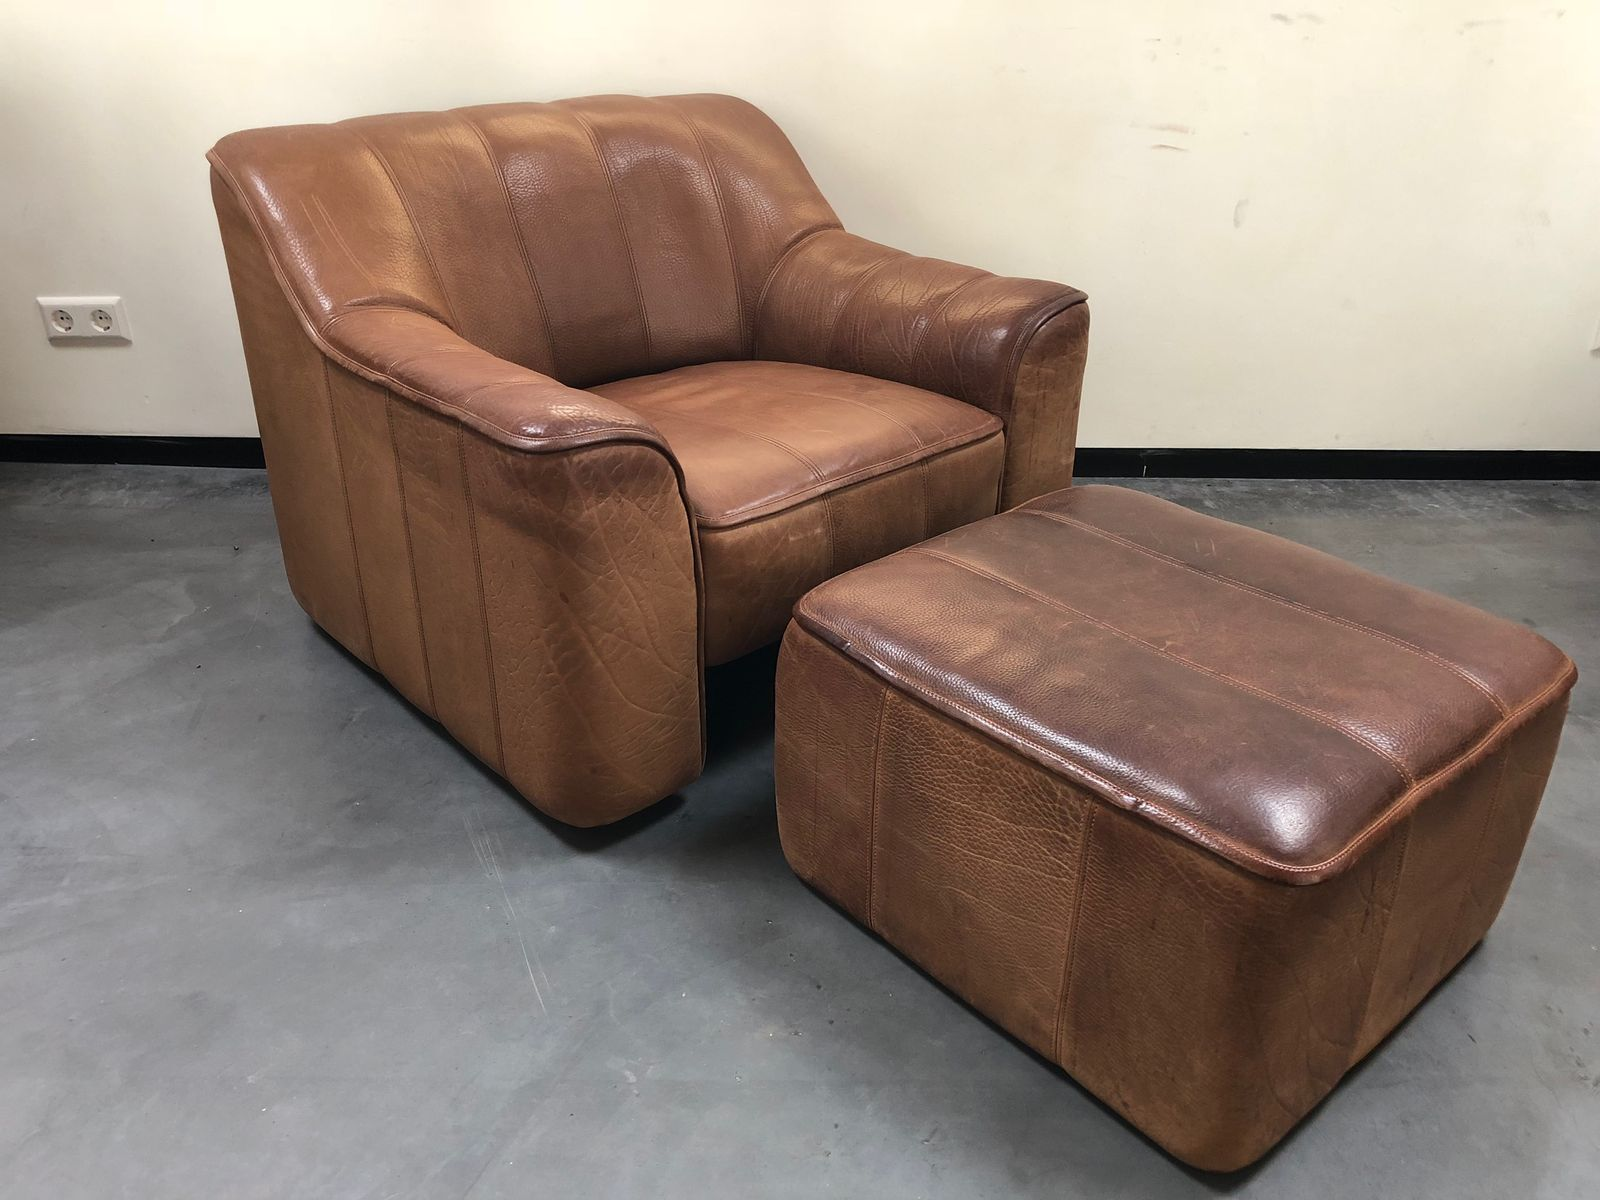 DS44 DS 44 Chair U0026 Ottoman Set From De Sede, 1970s